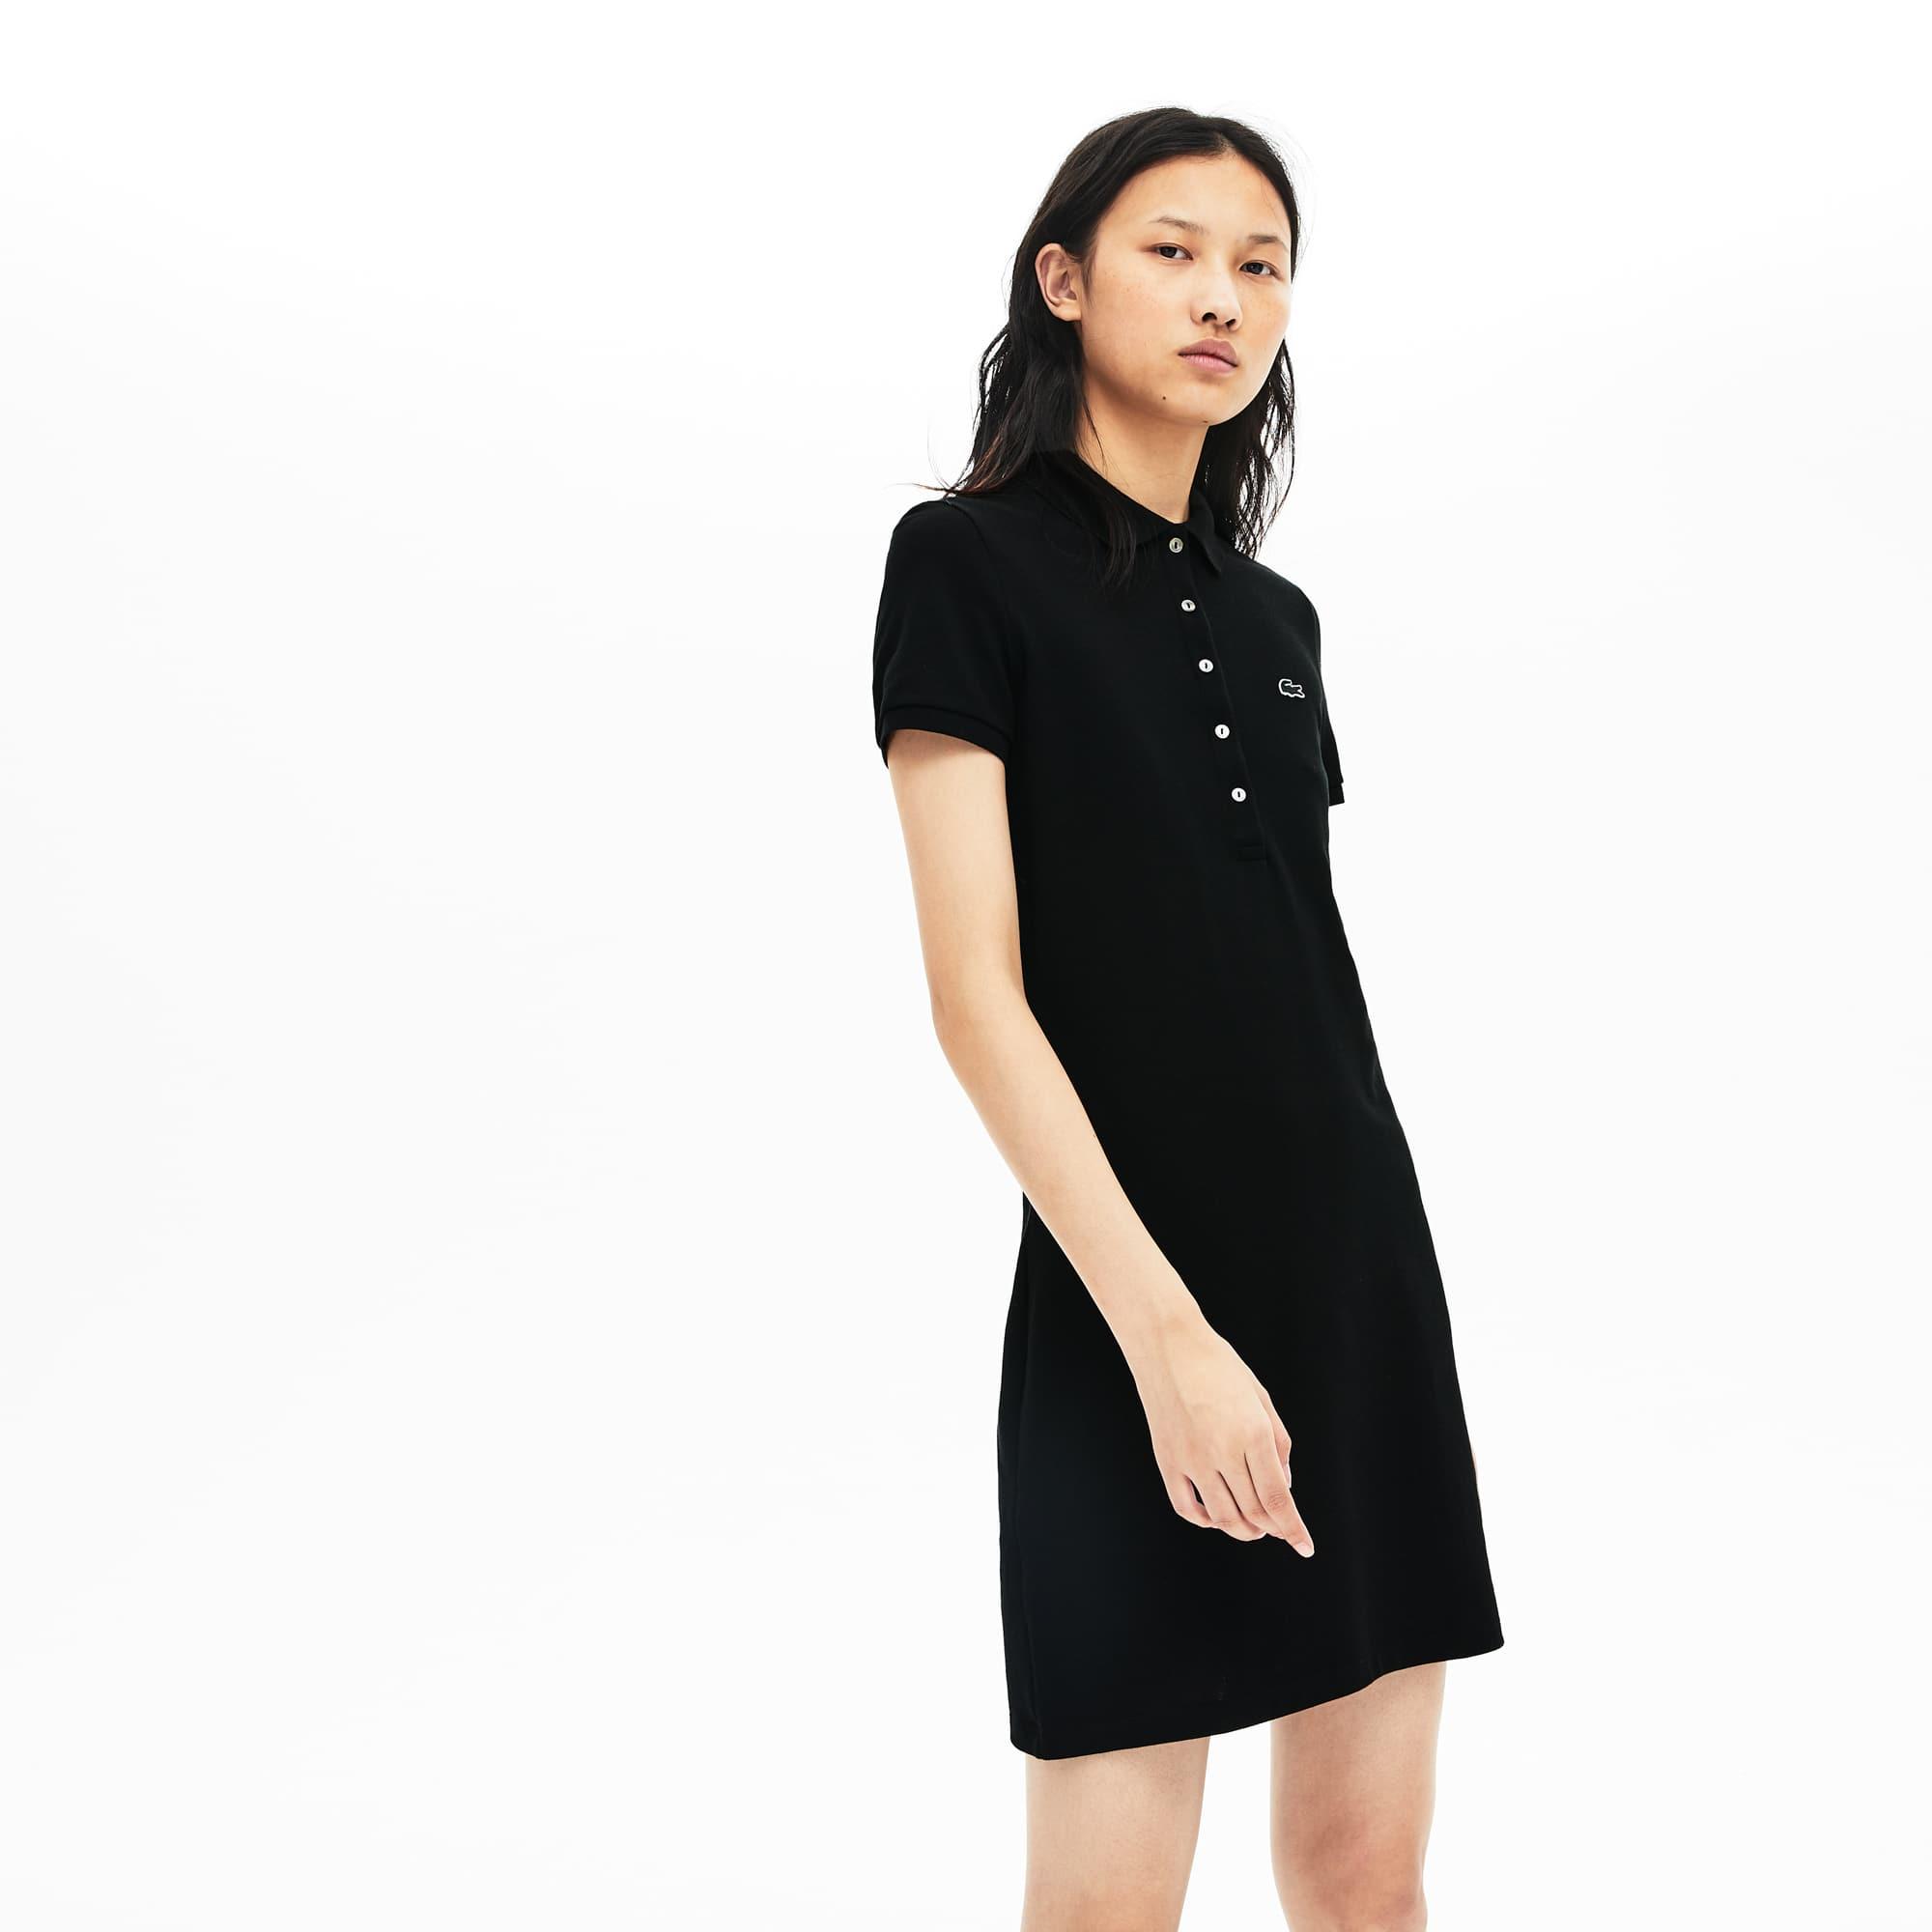 Damen-Polokleid aus Baumwoll-Mini-Piqué mit Stretch